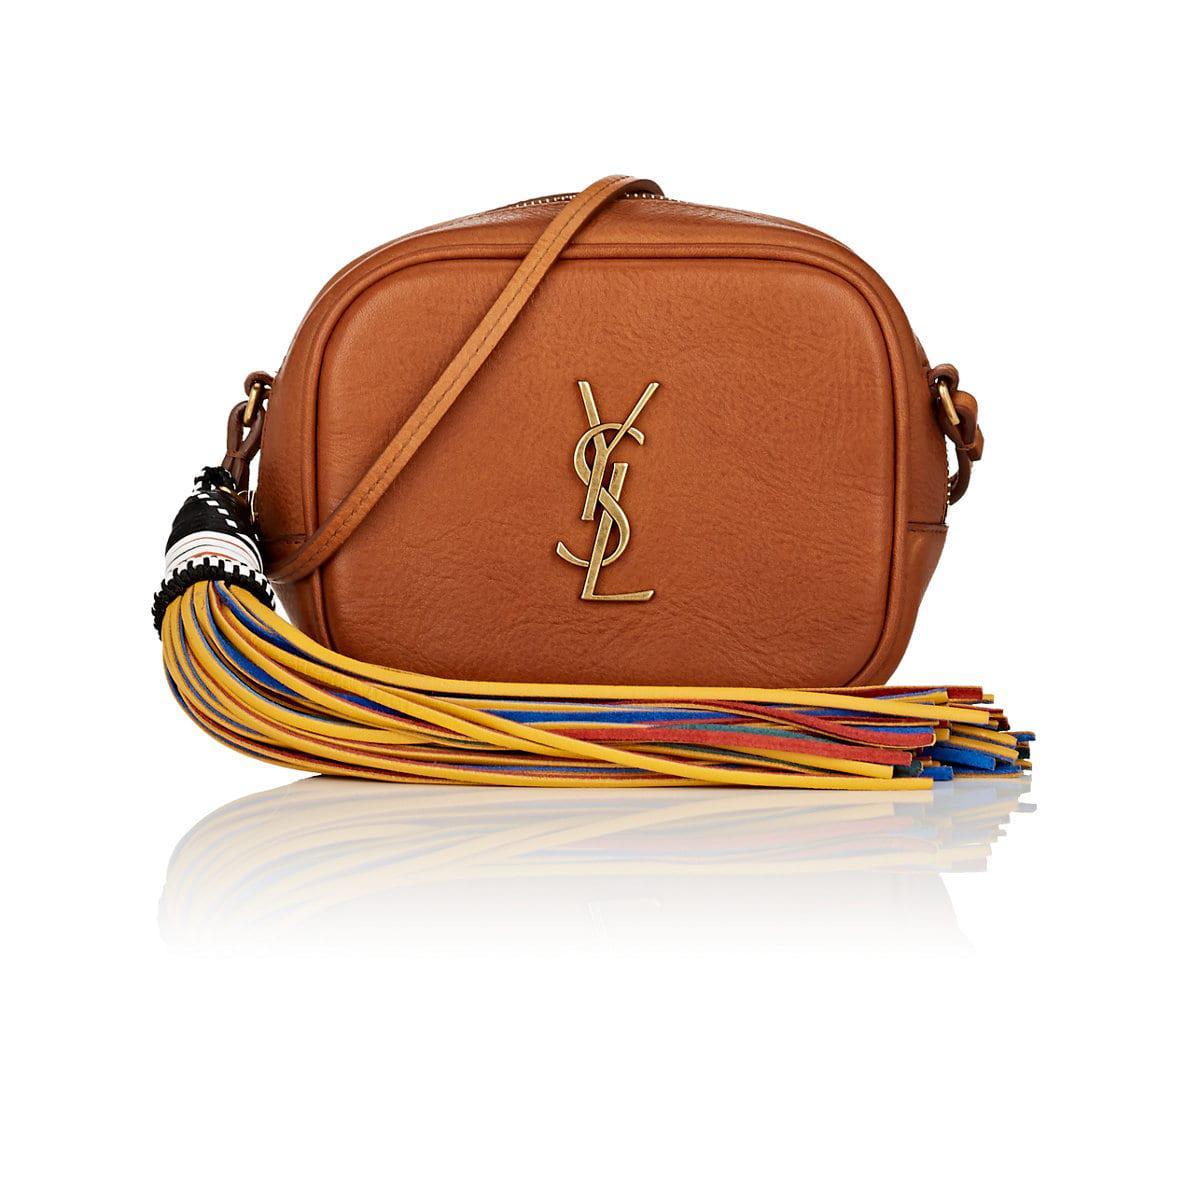 6fc49b6526 Lyst - Saint Laurent Monogram Blogger Leather Crossbody Bag in Brown